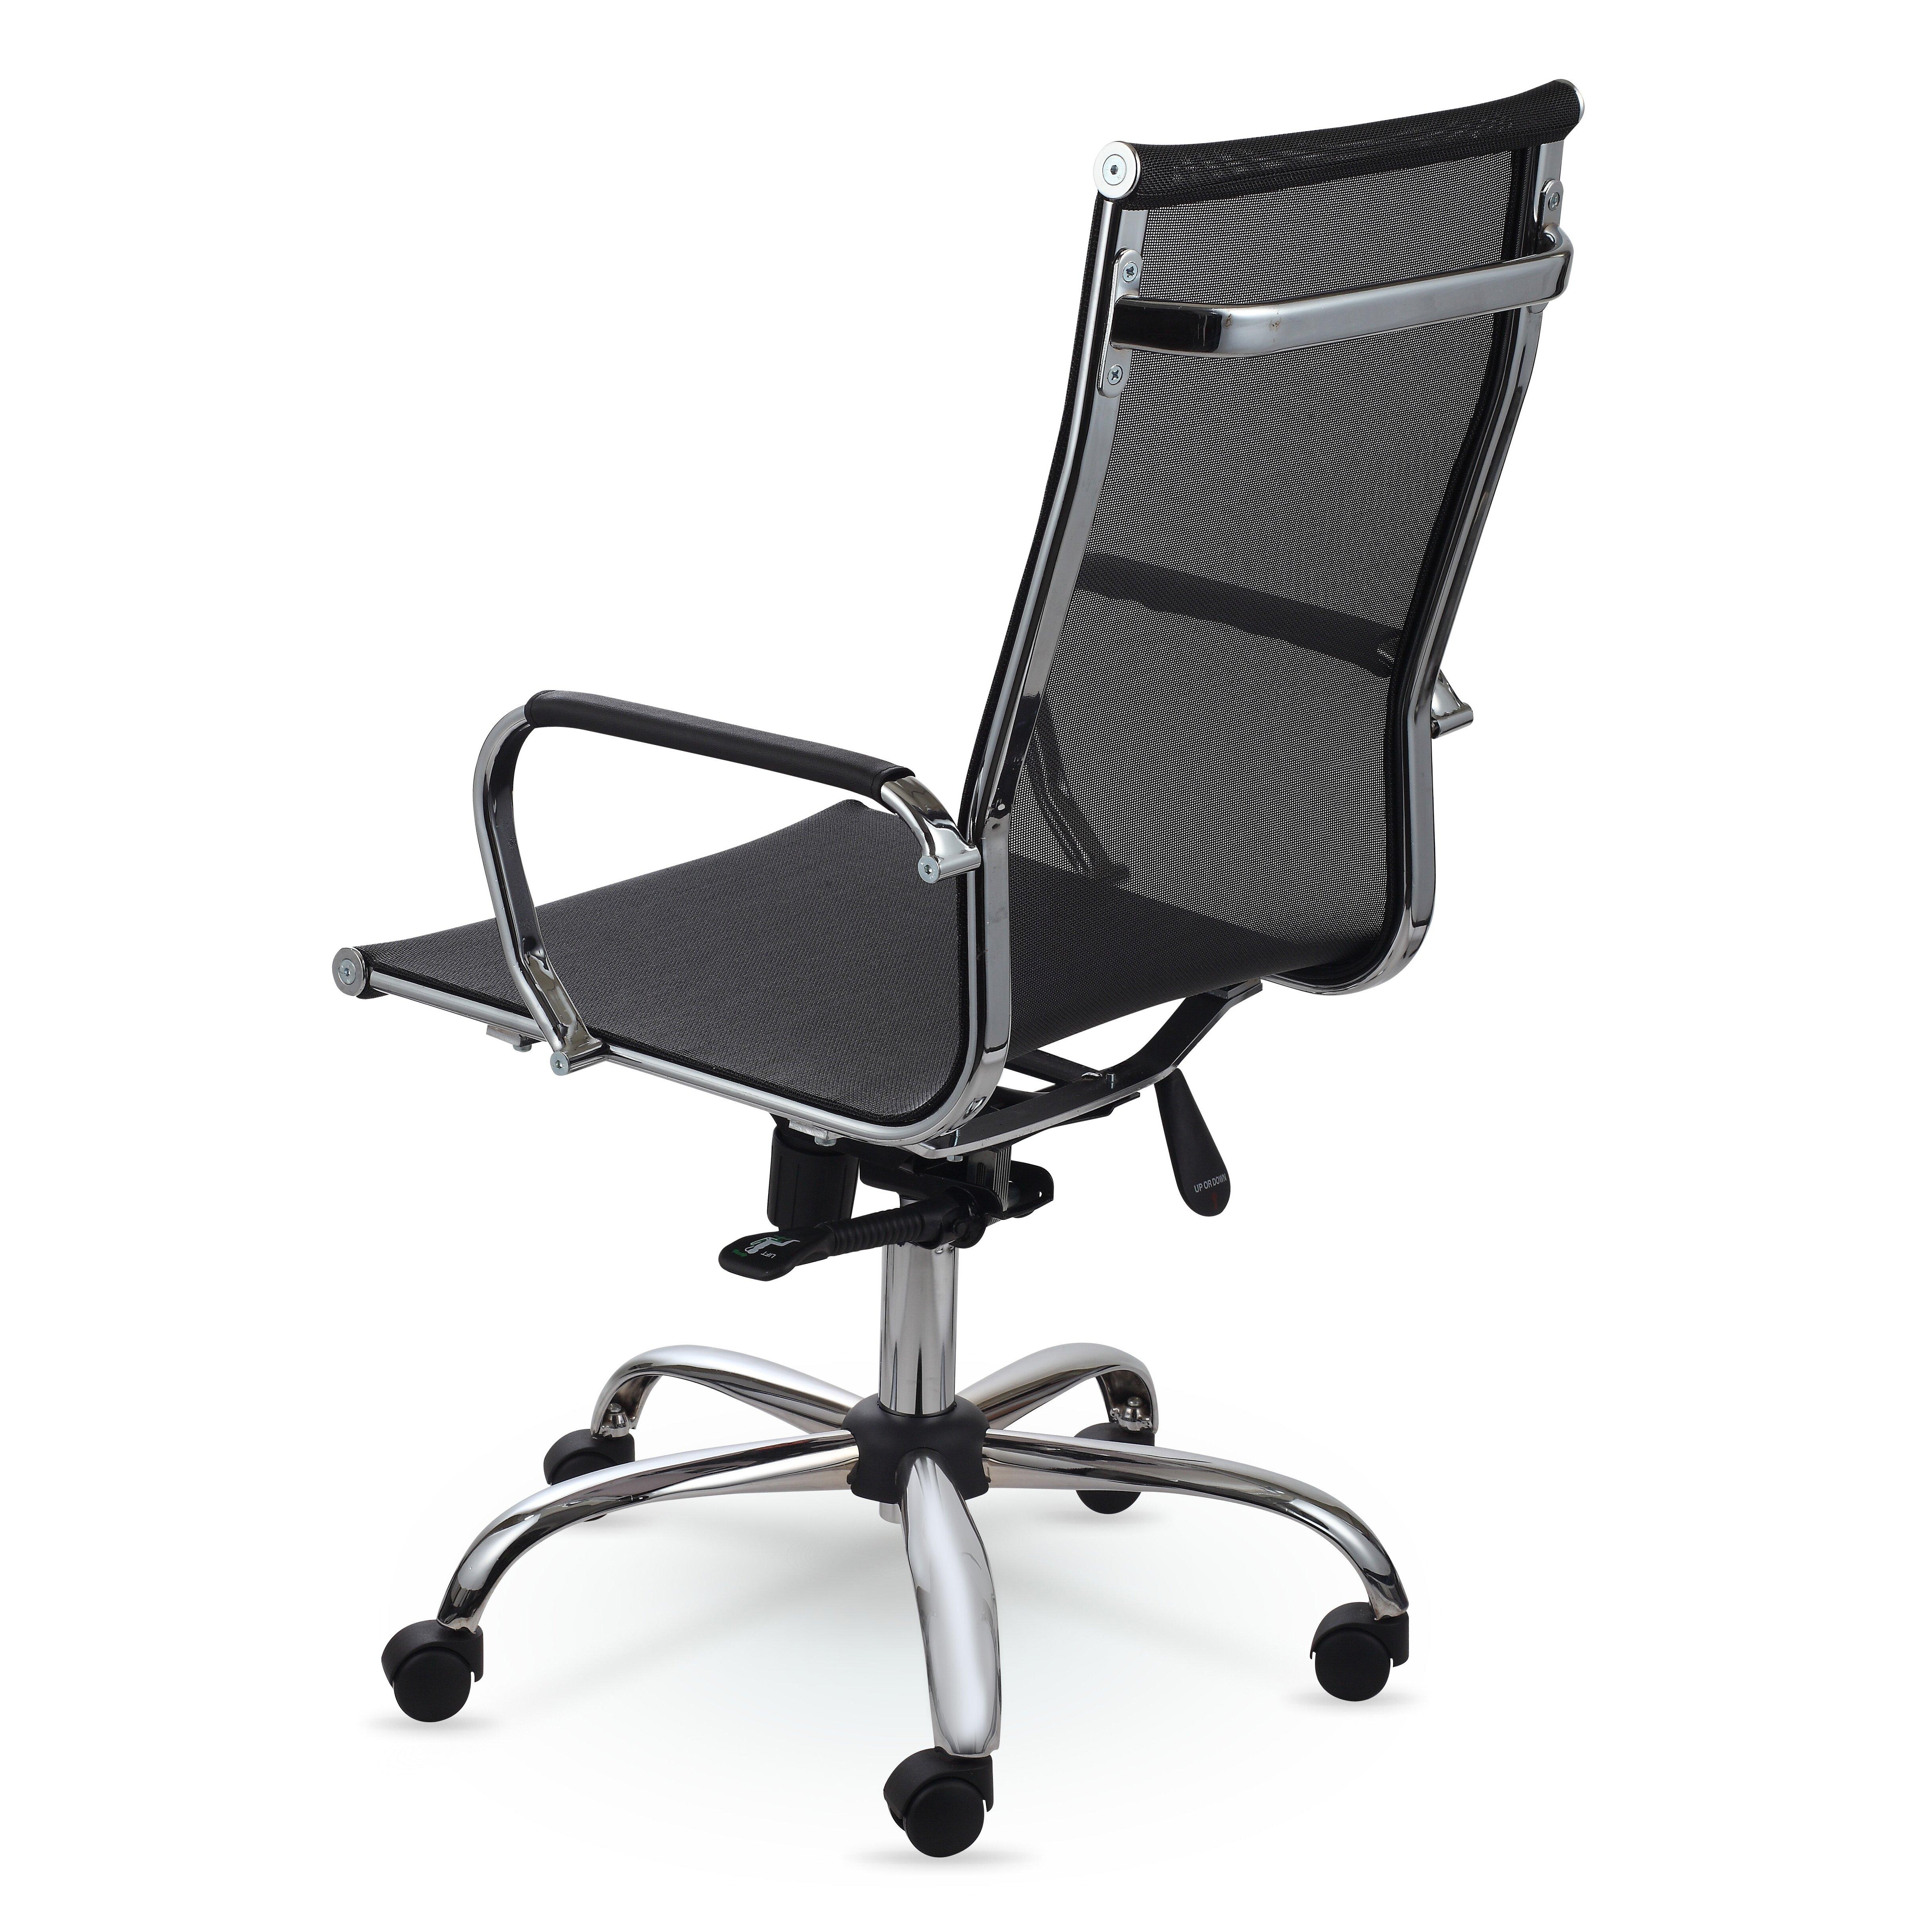 Furniture industries office chair winport industries for Abanos furniture industries decoration llc